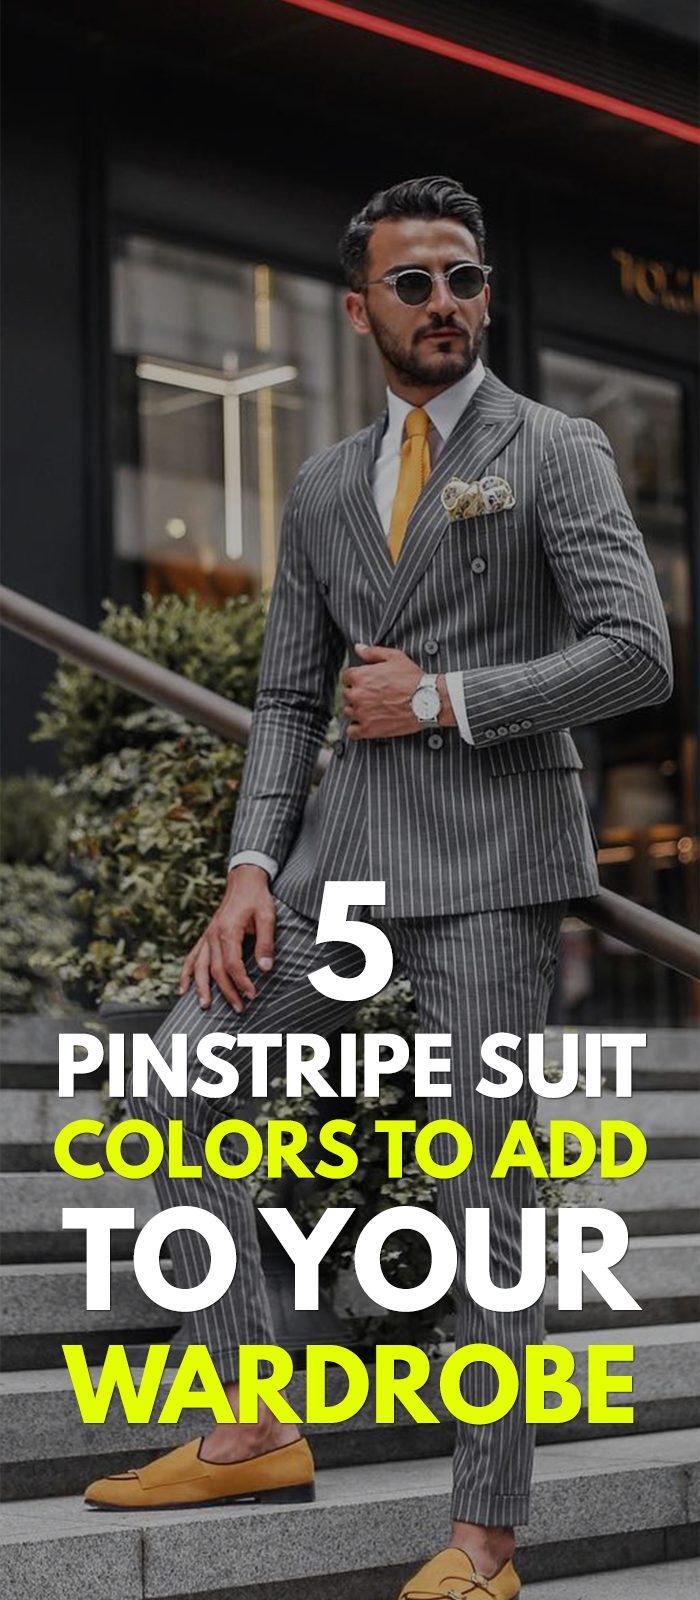 Pinstripe Suit Colors for 2020